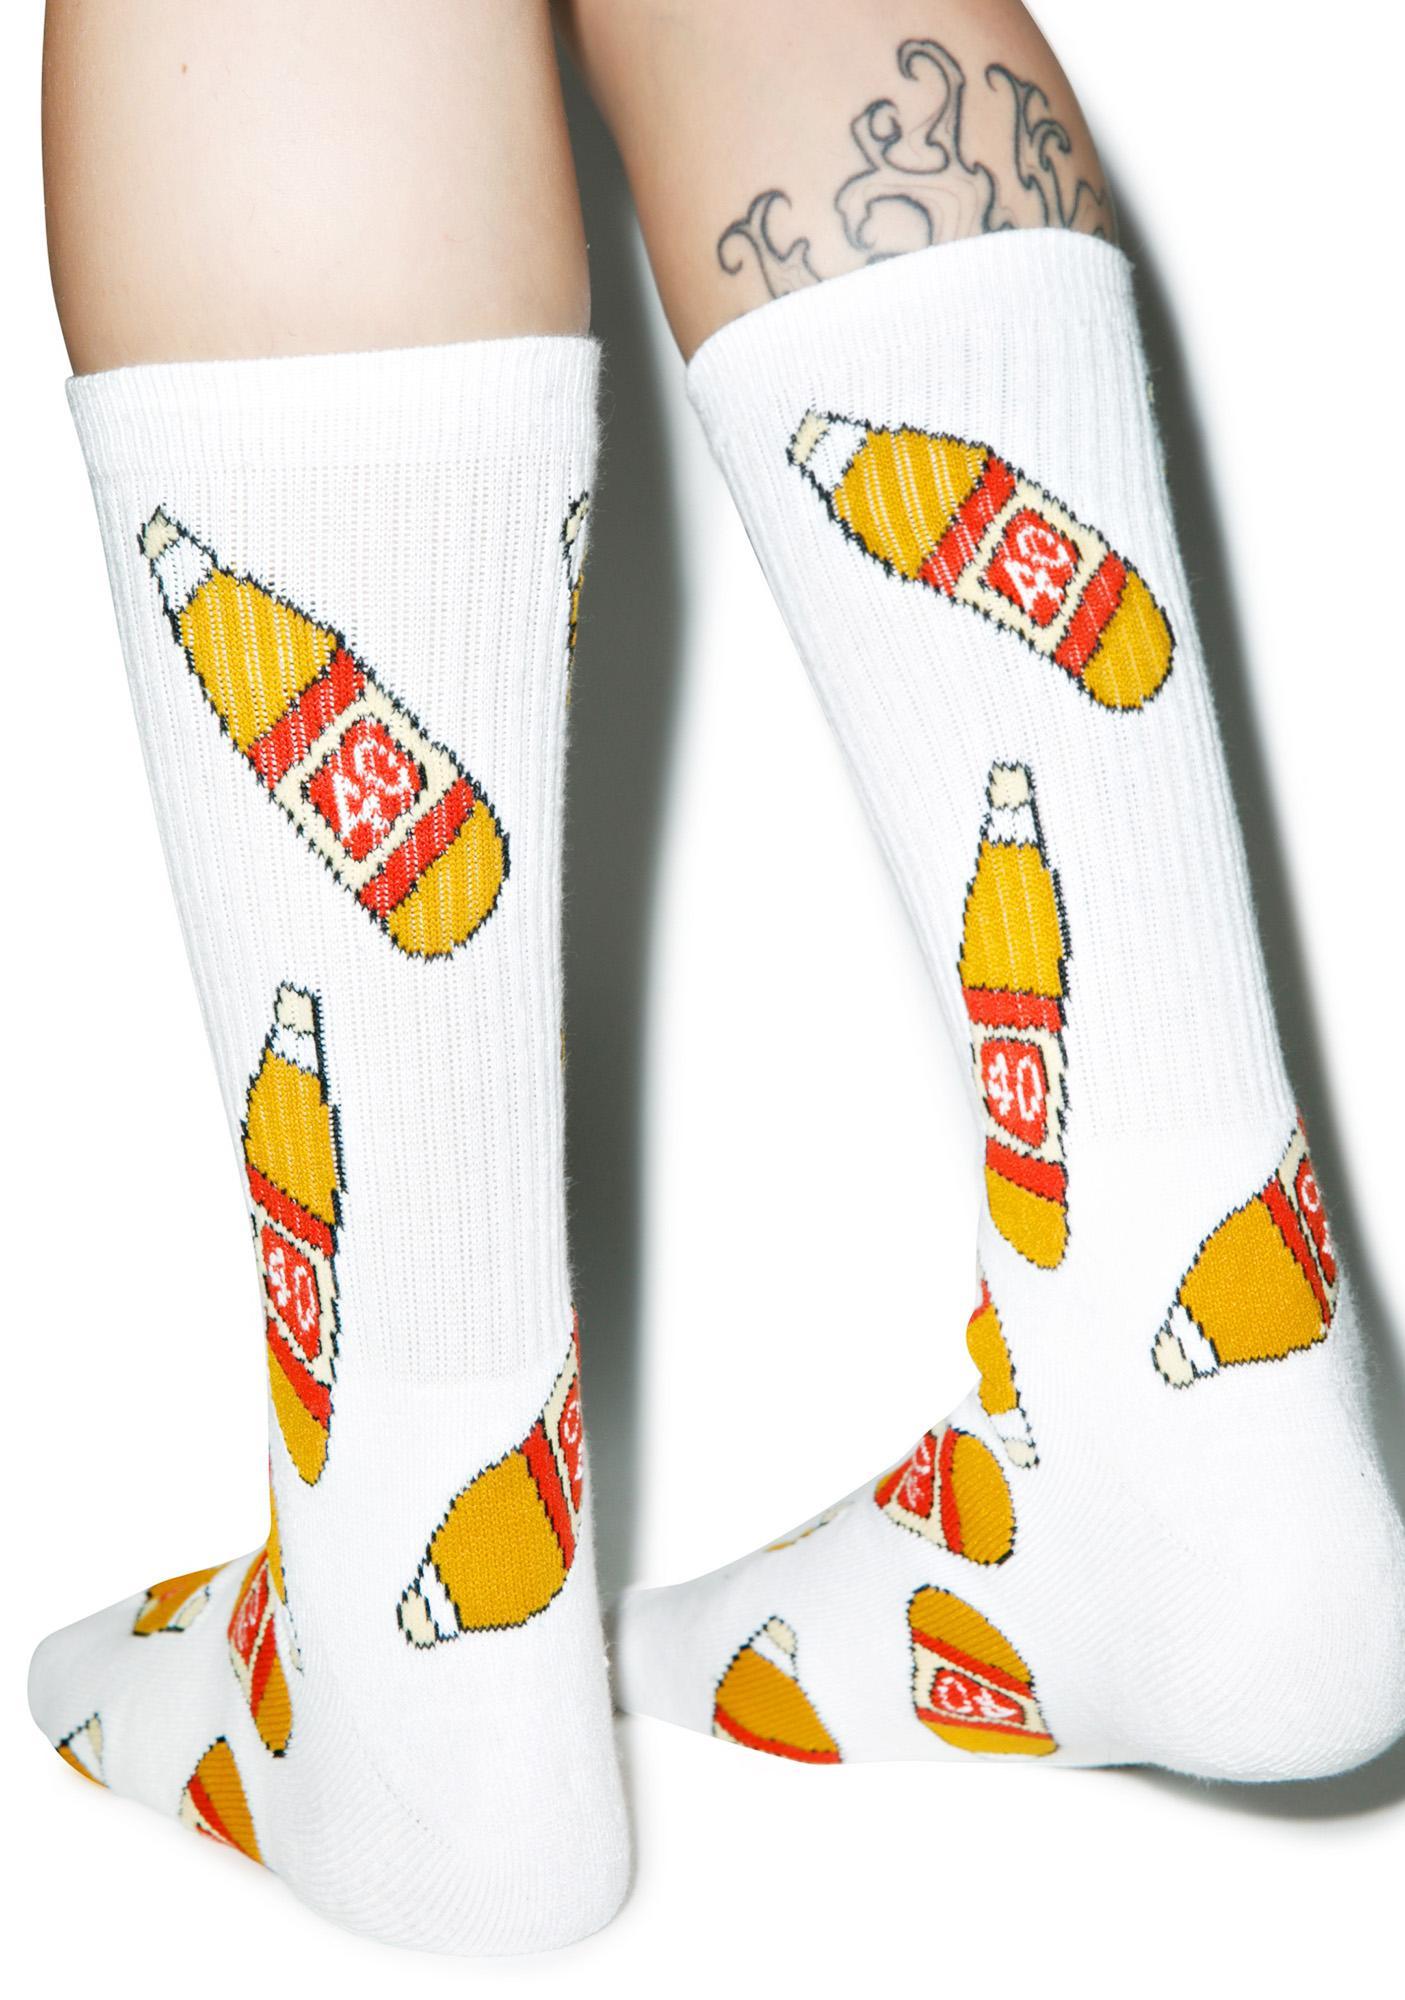 40s & Shorties 40s Socks